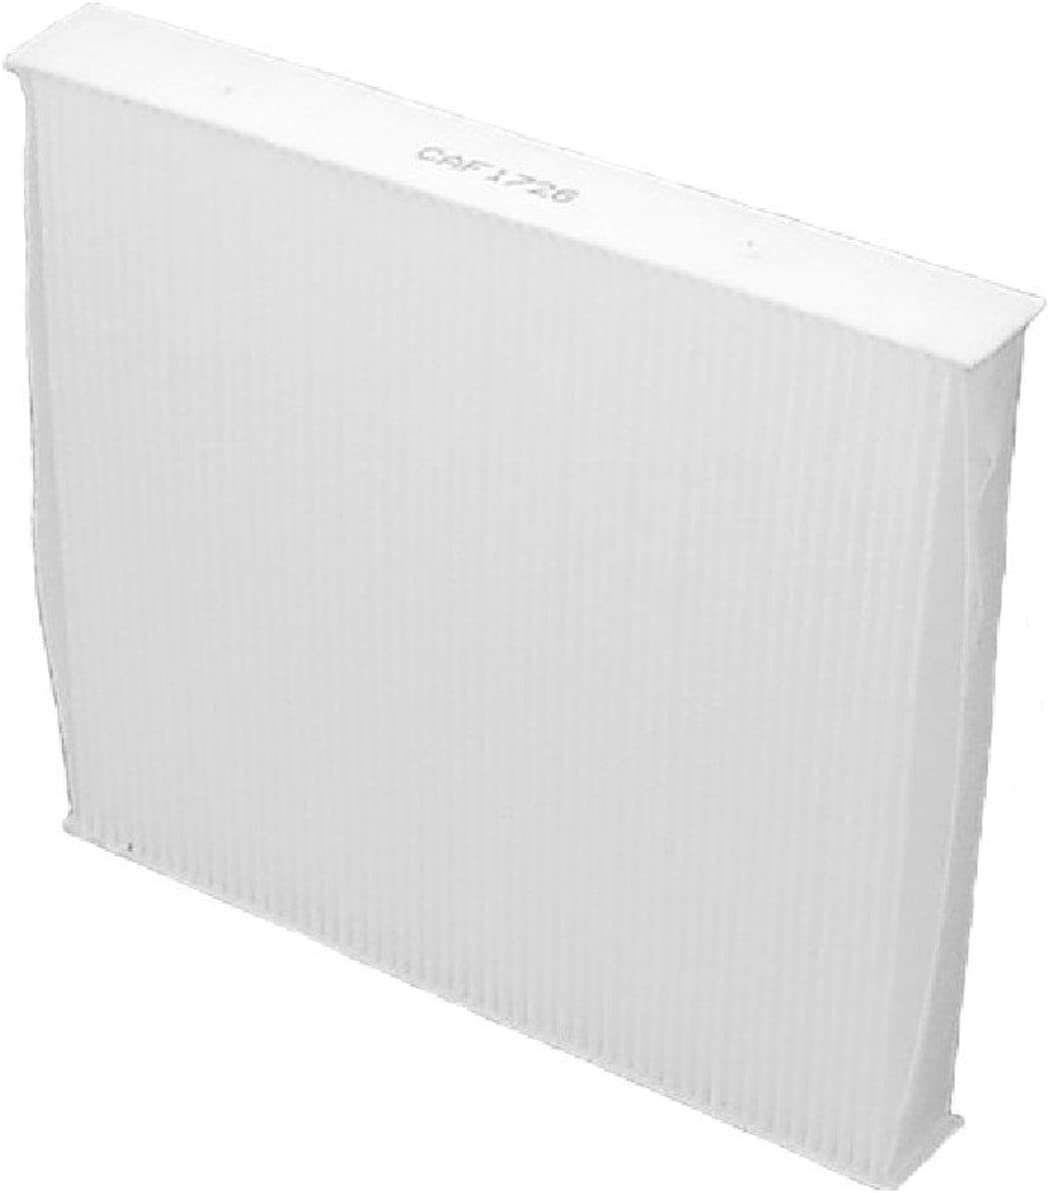 6 Pack Luber-finer CAF1883P-6PK Cabin Air Filter